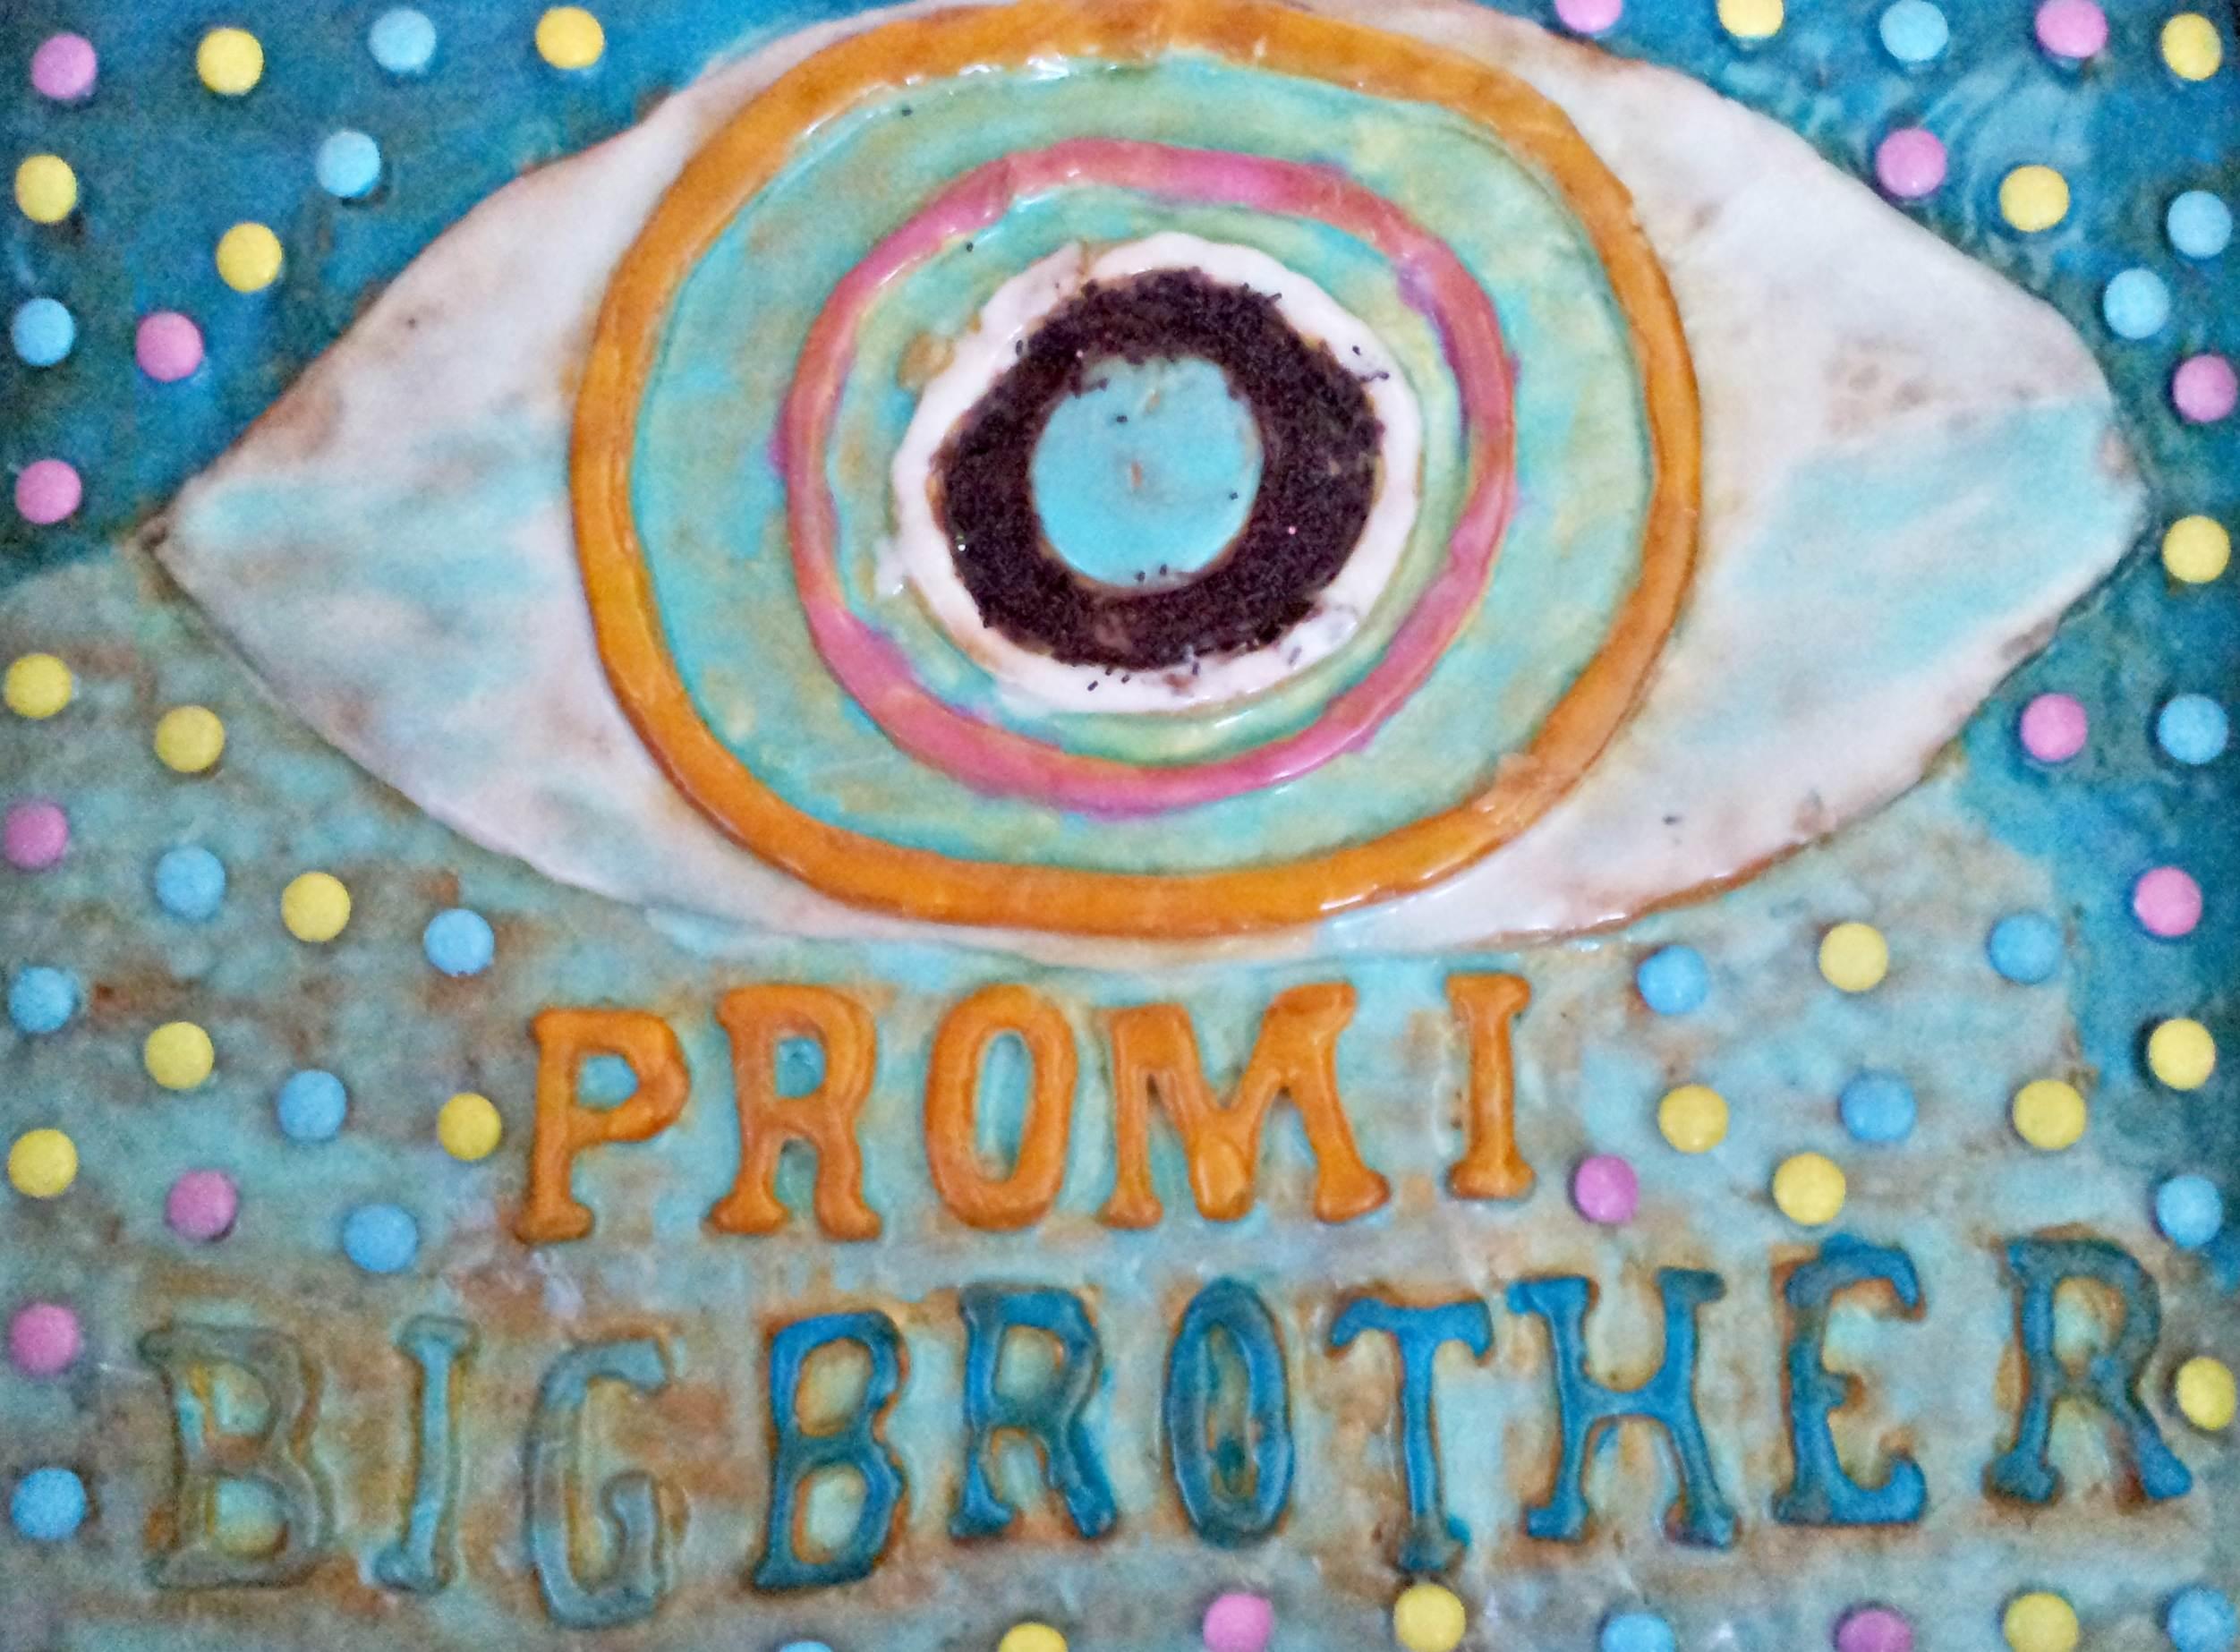 Promi Big Brother 3D Kuchen fertig